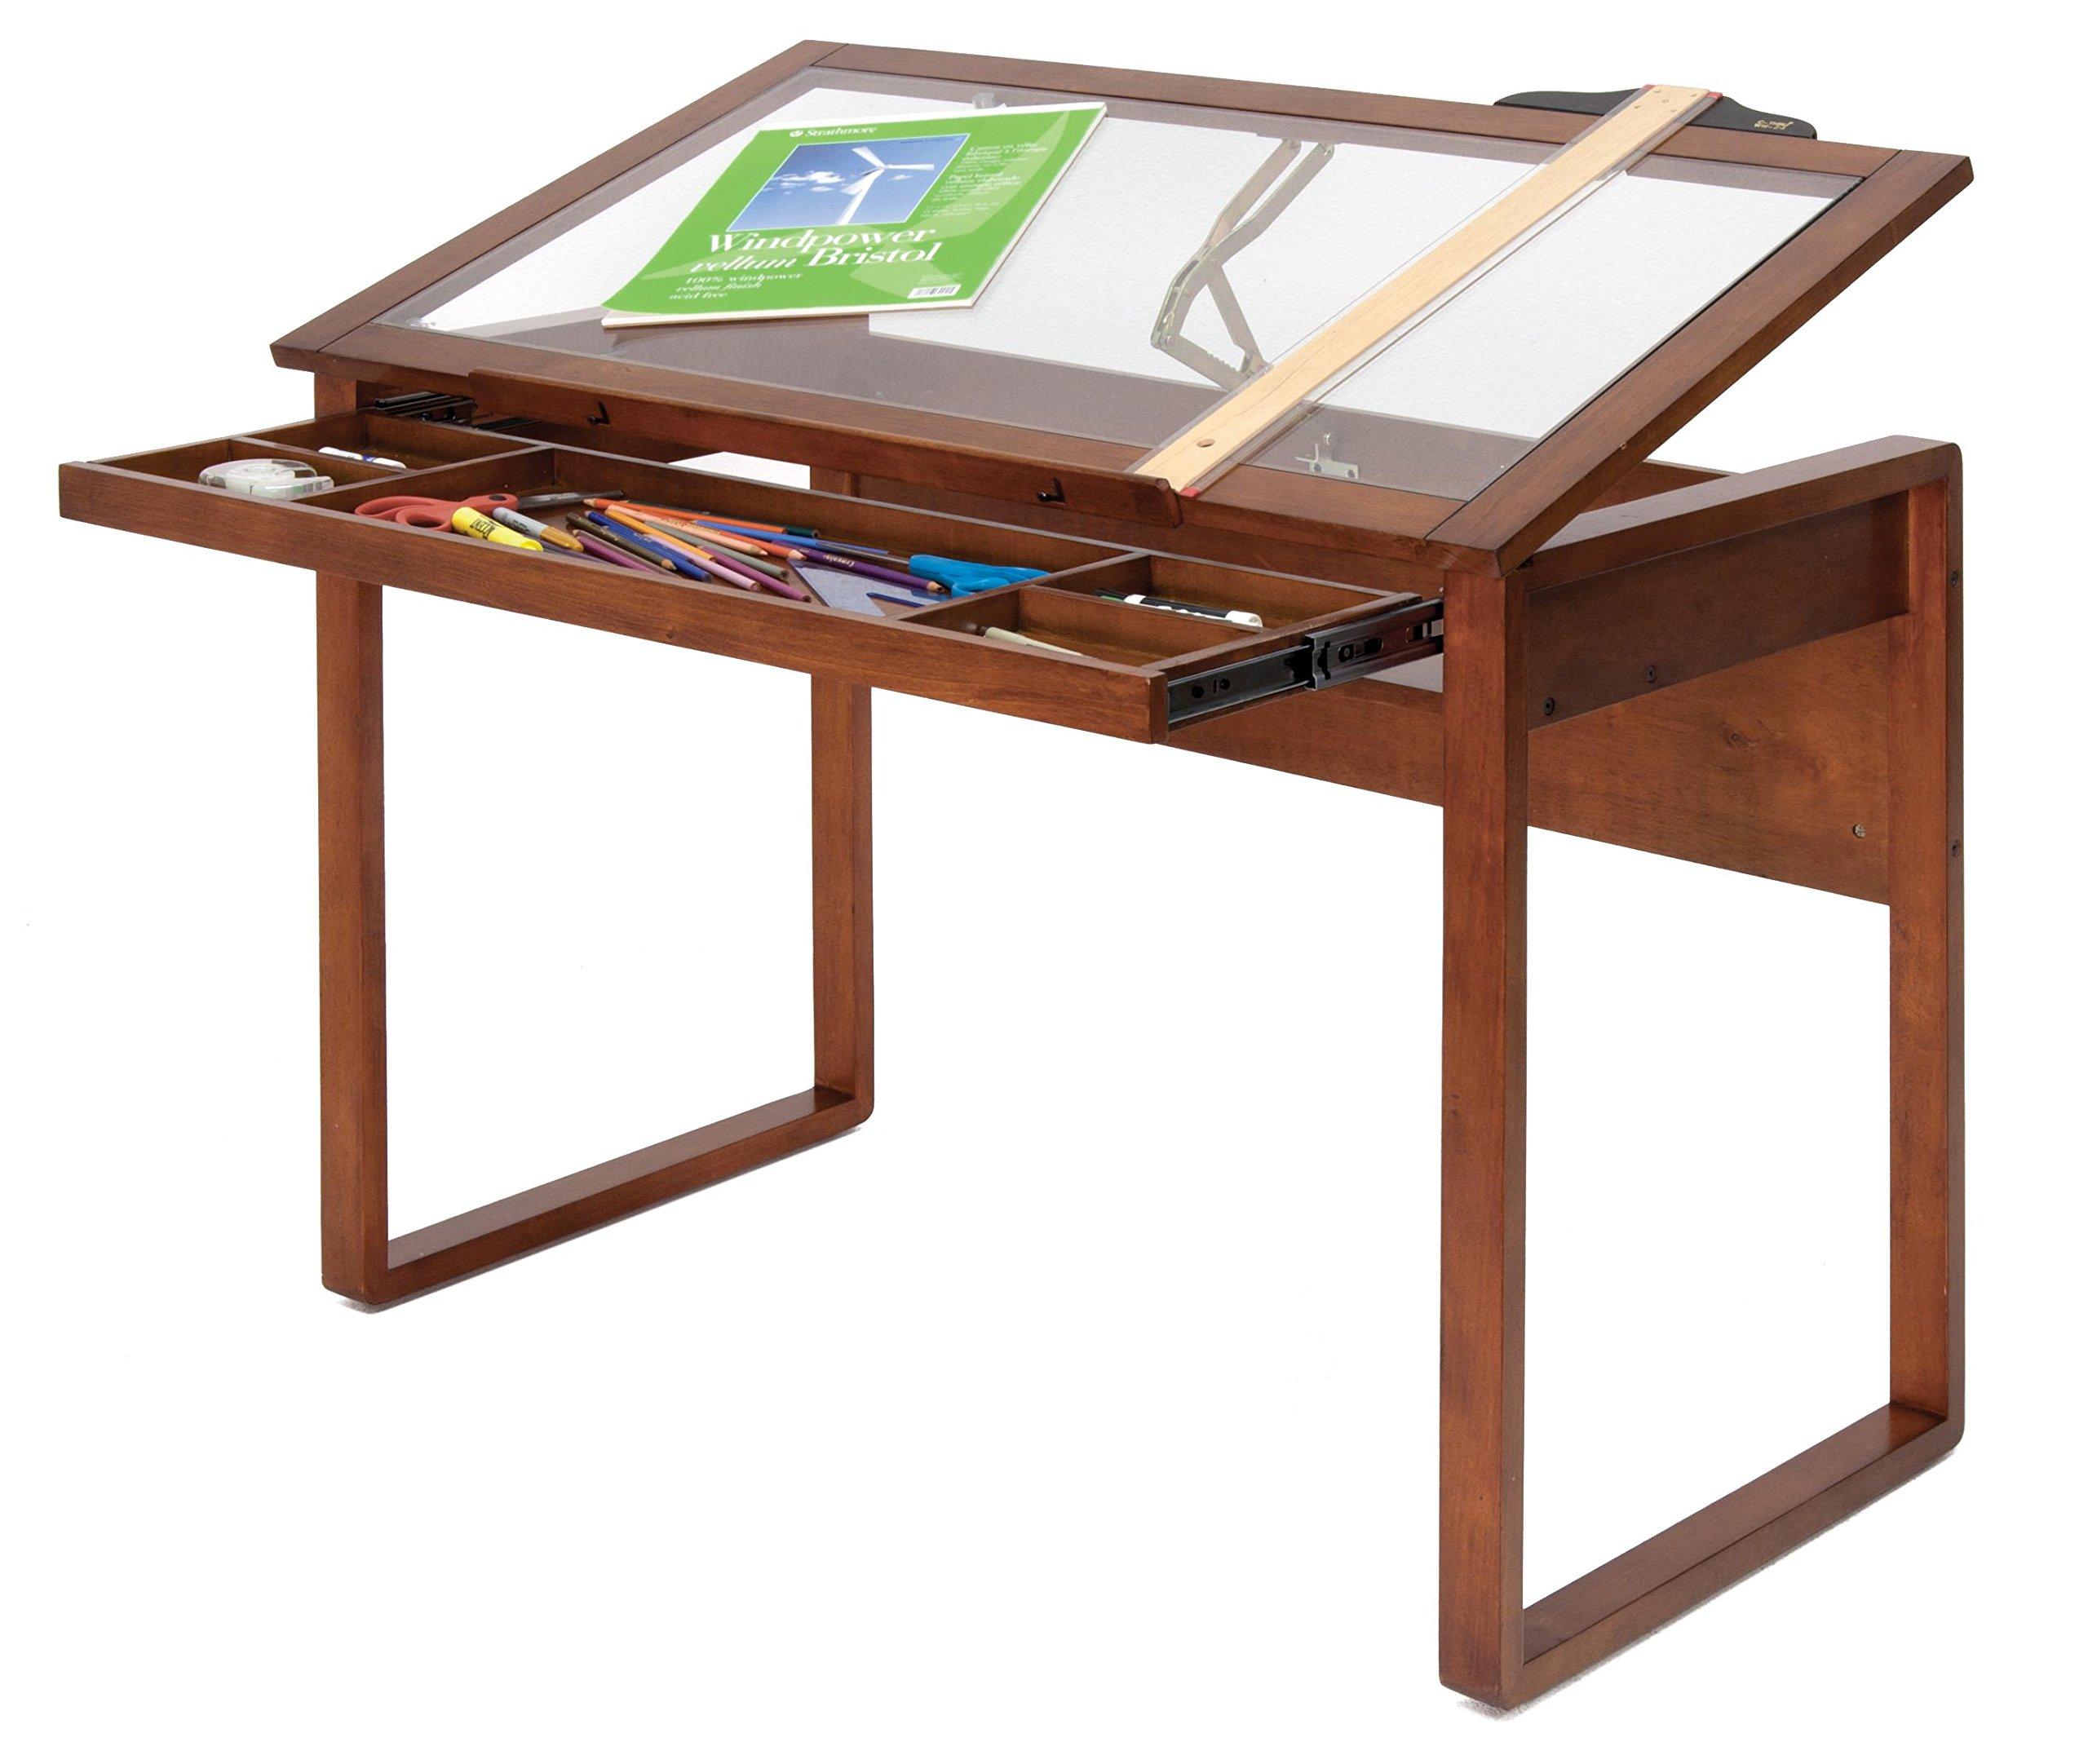 Studio Designs Ponderosa Table Glass Top